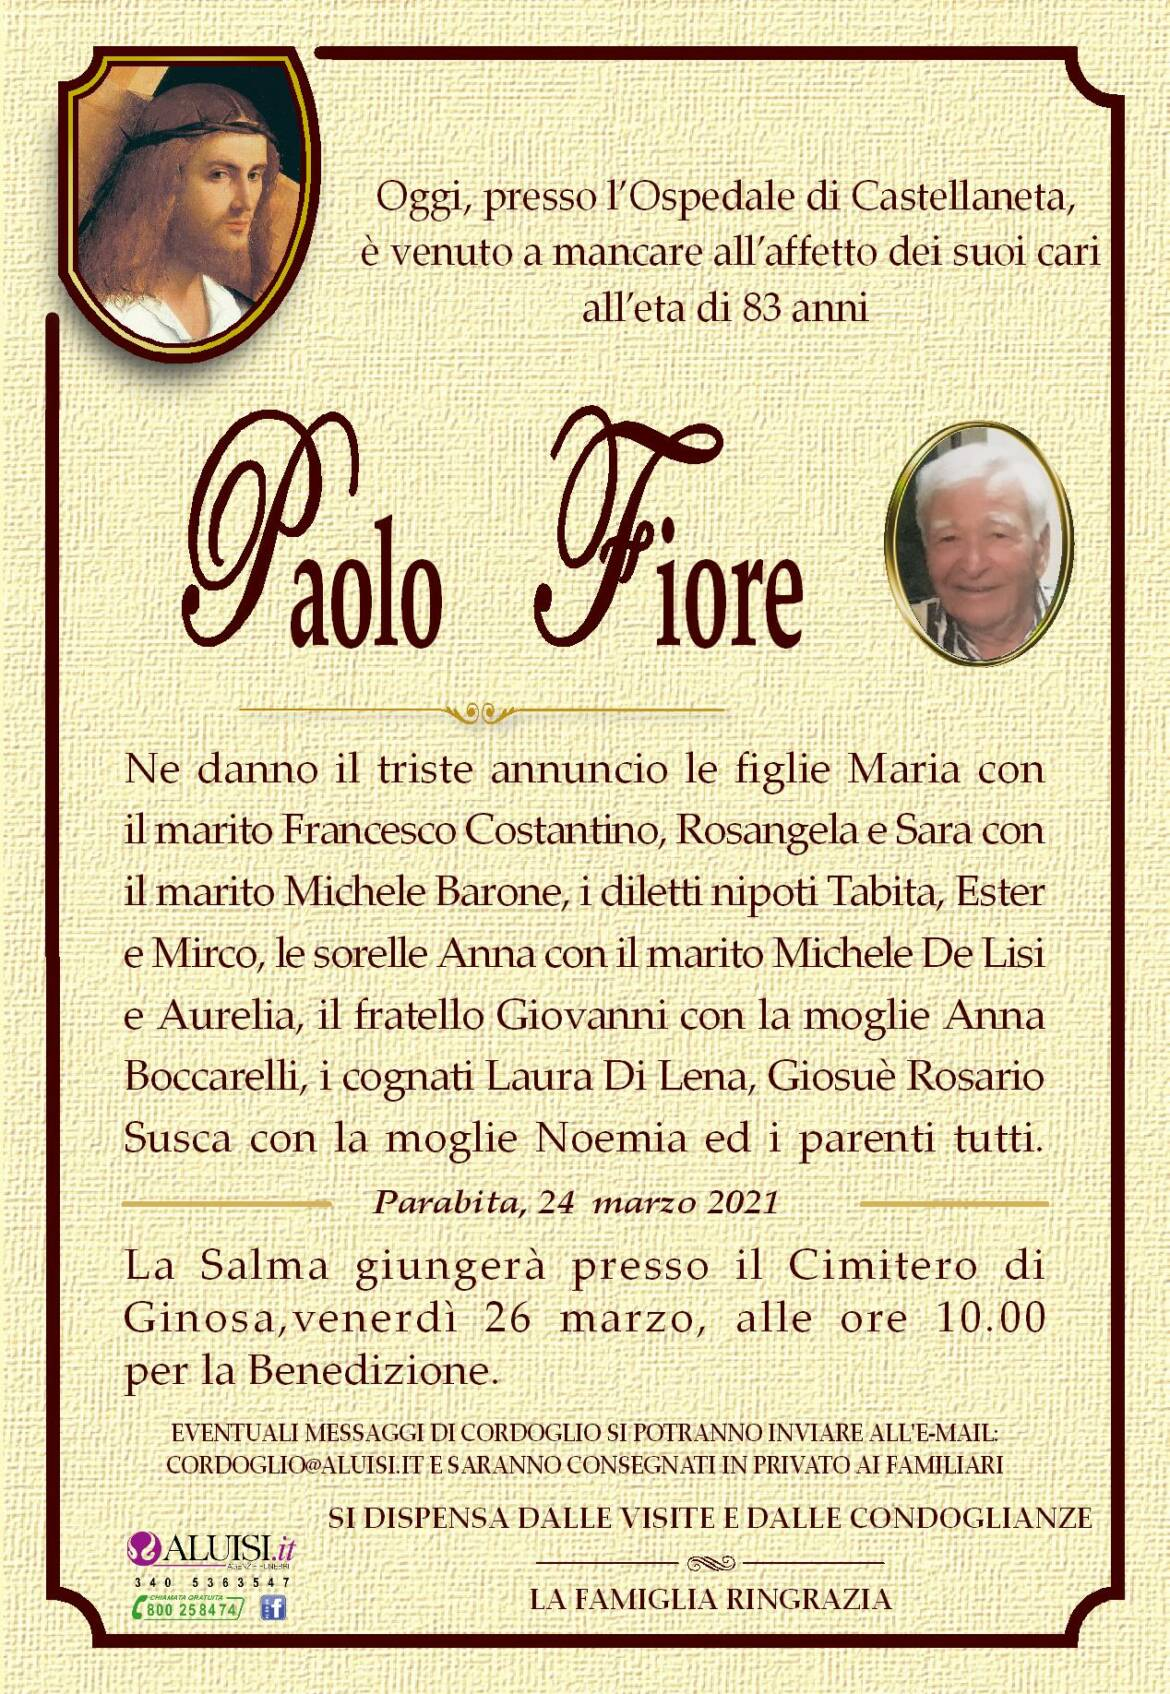 Annuncio-PAOLO-FIORE-PARABITA-GINOSA-1.jpg